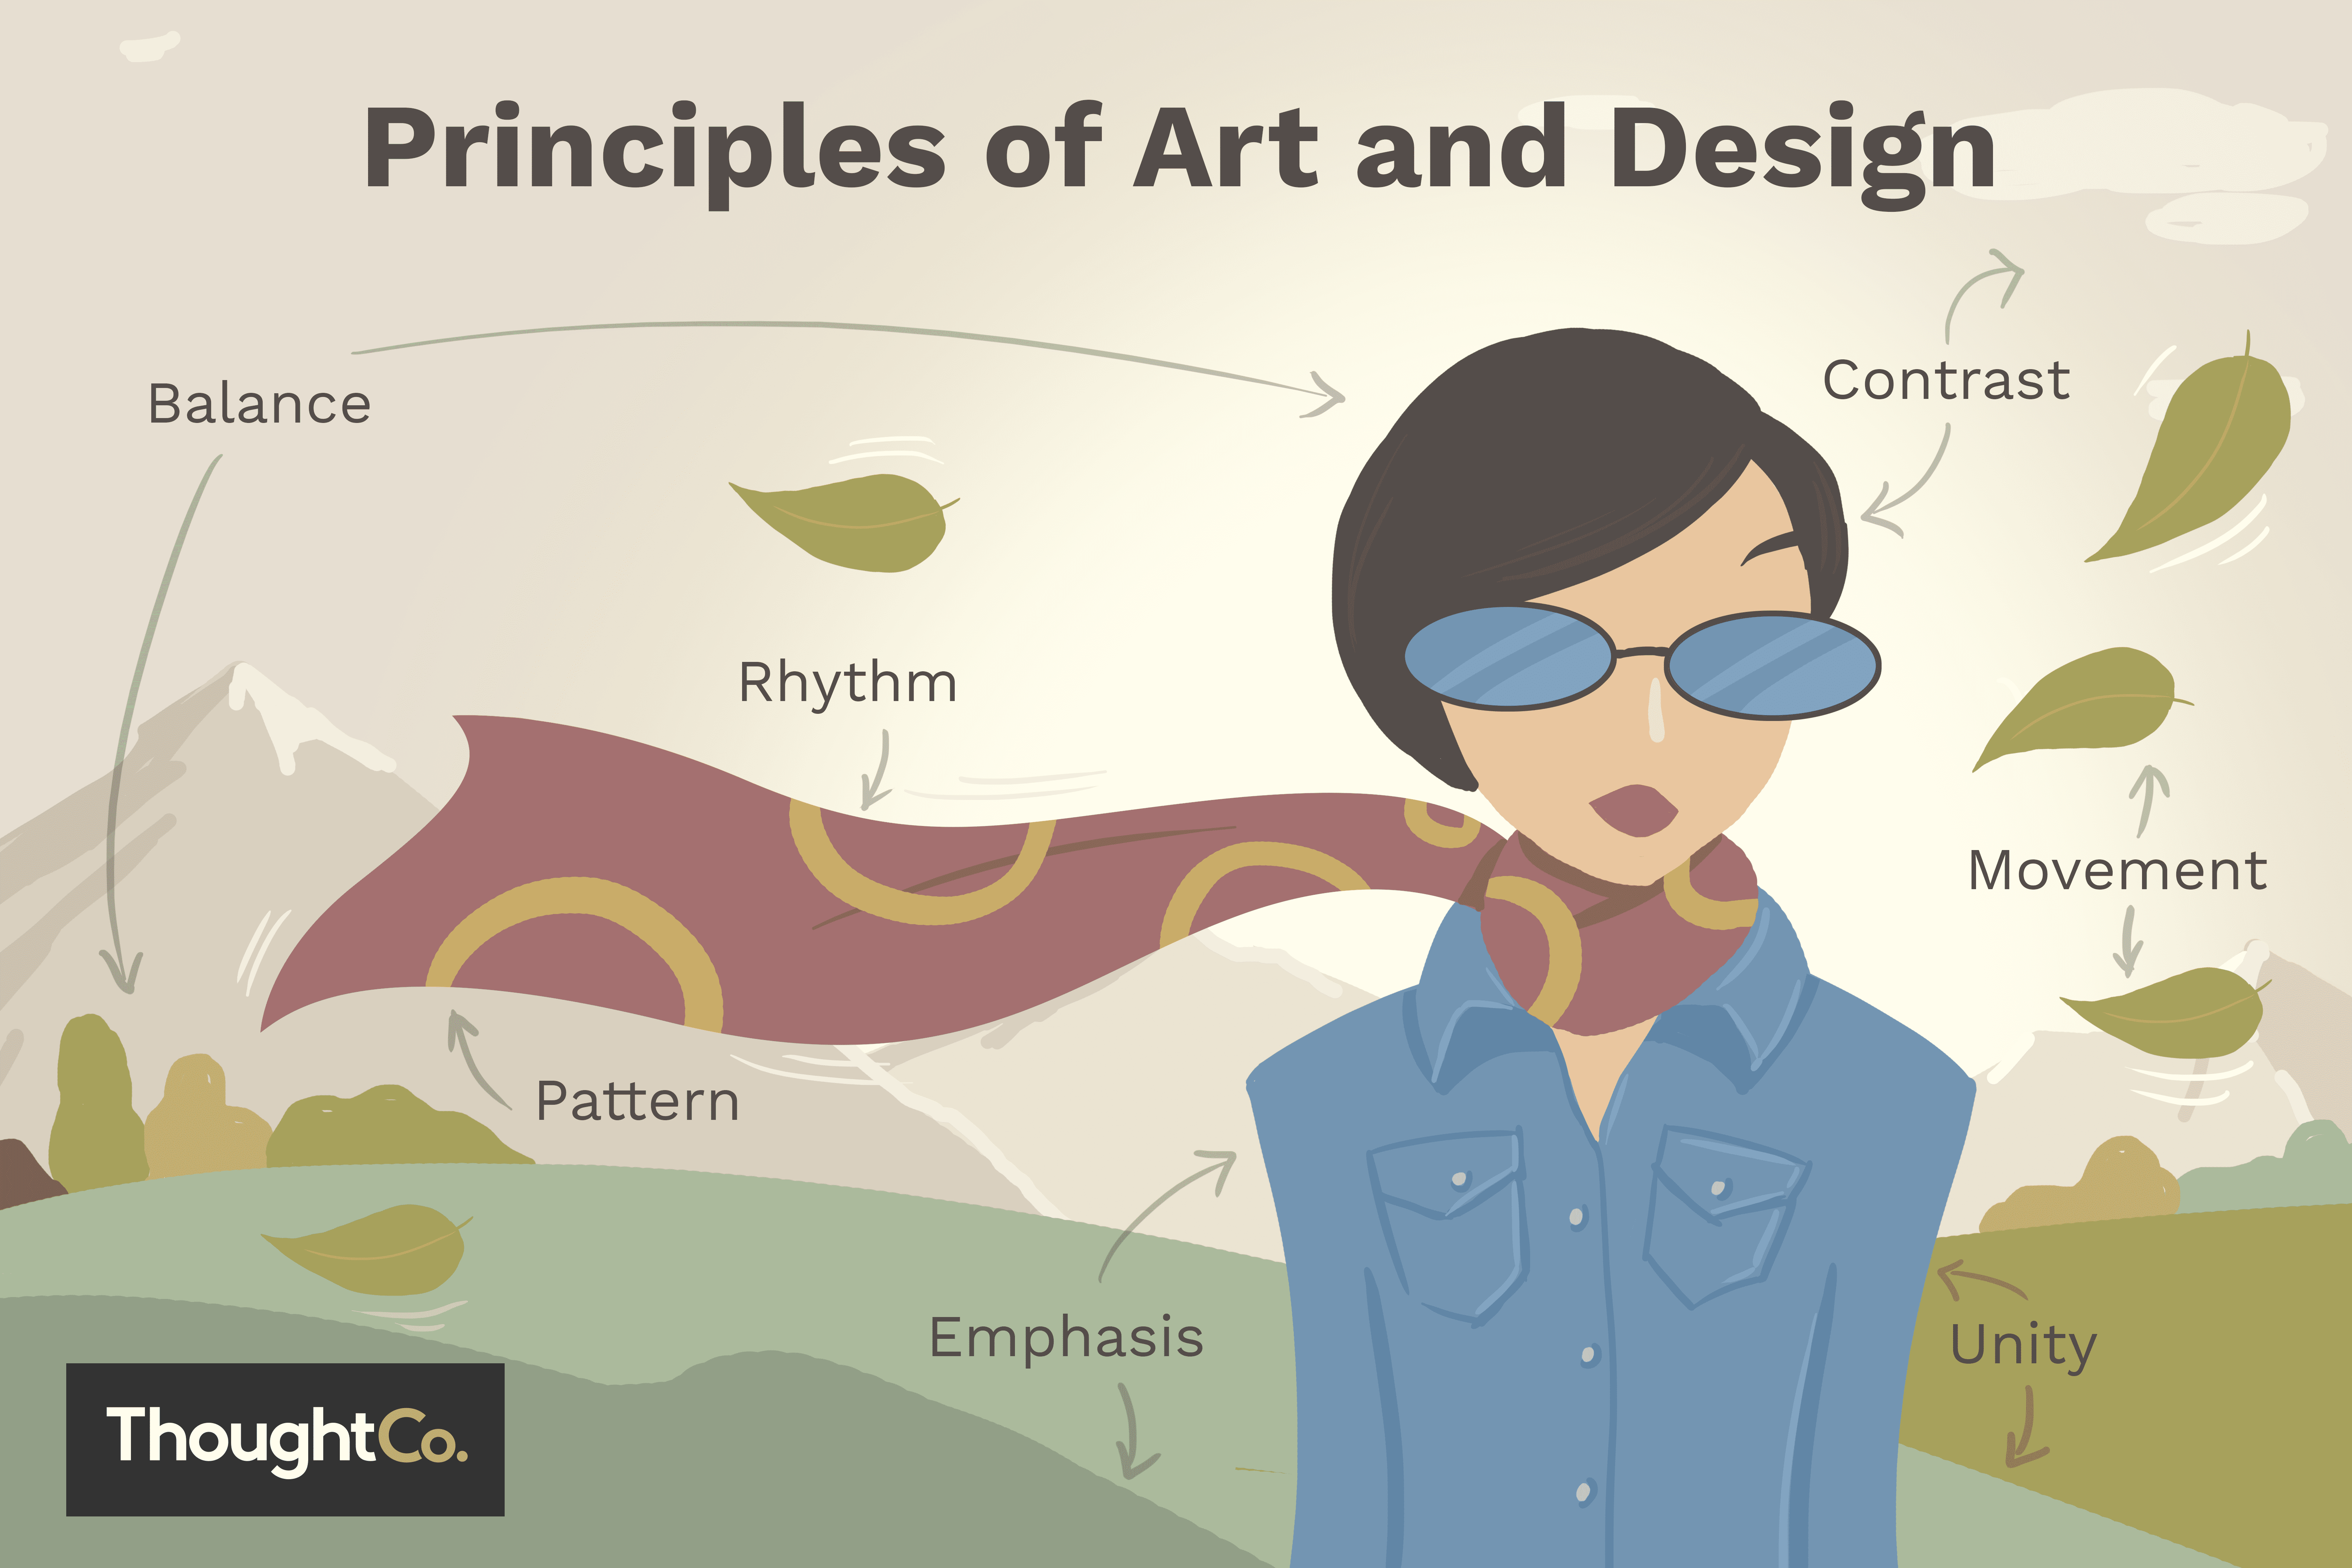 7 Principles Of Art And Design Principles Of Art Principles Of Design Principles Of Art Balance